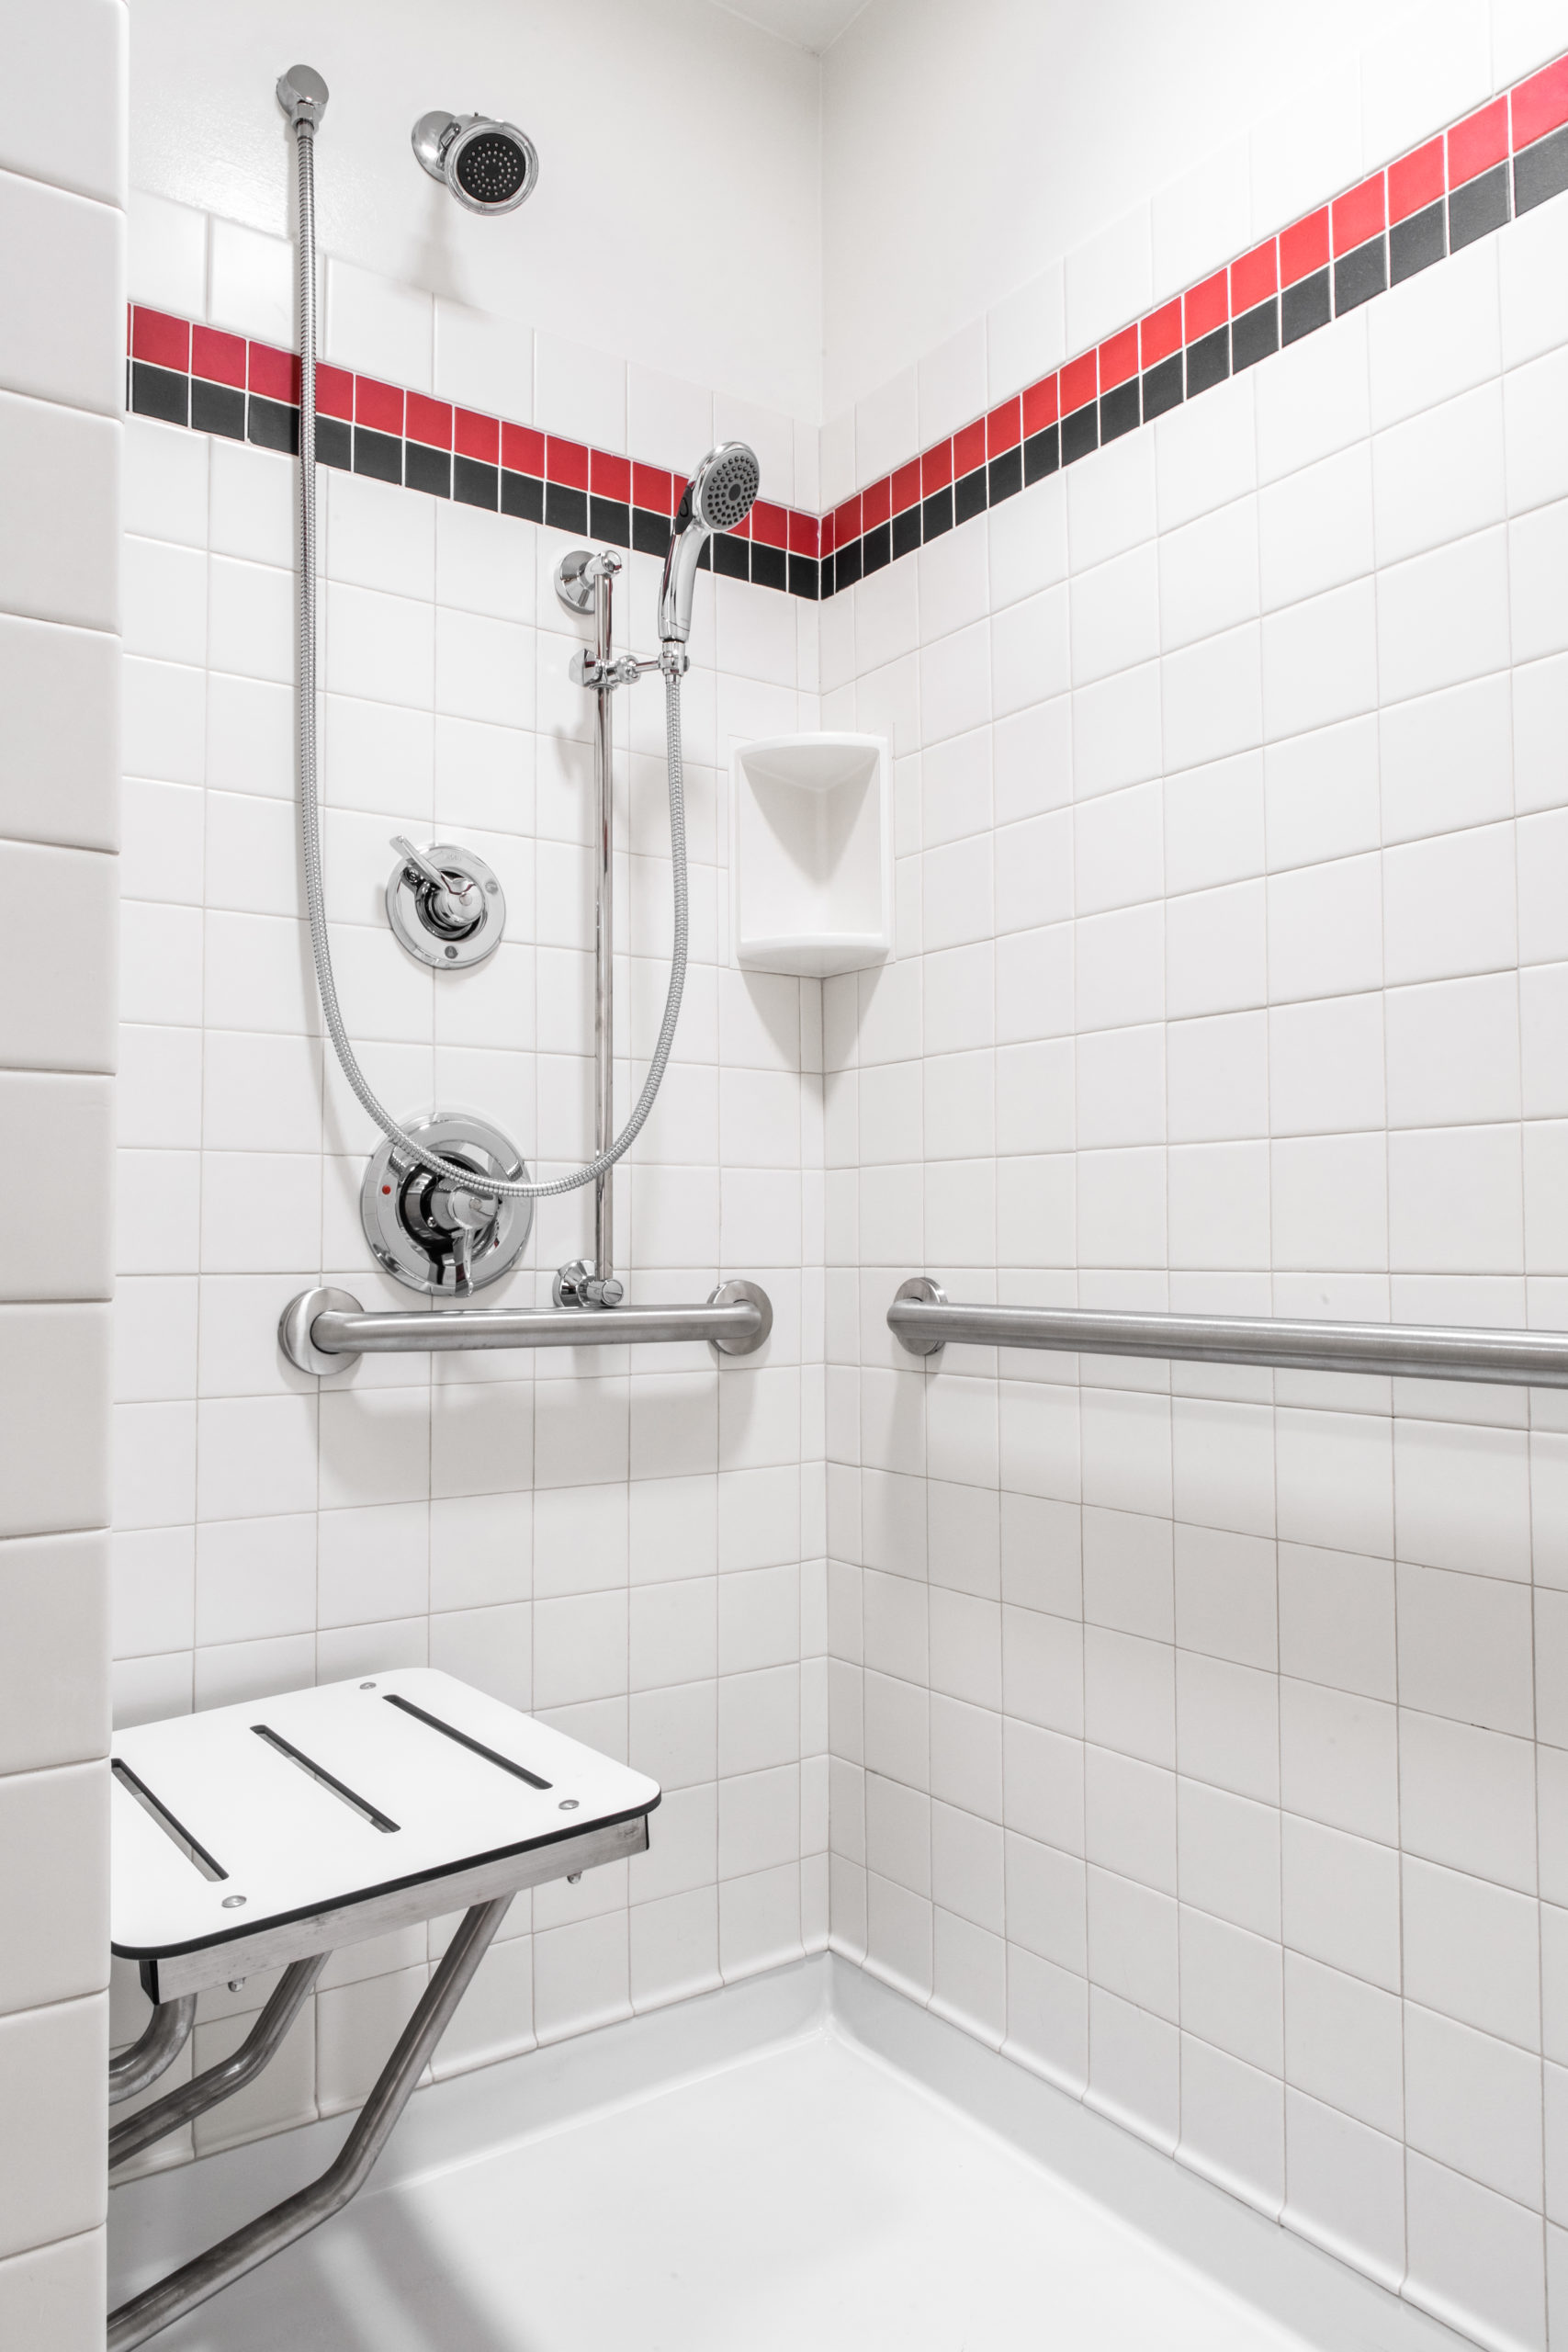 Mathews Hall Dormitory Bathroom Renovations